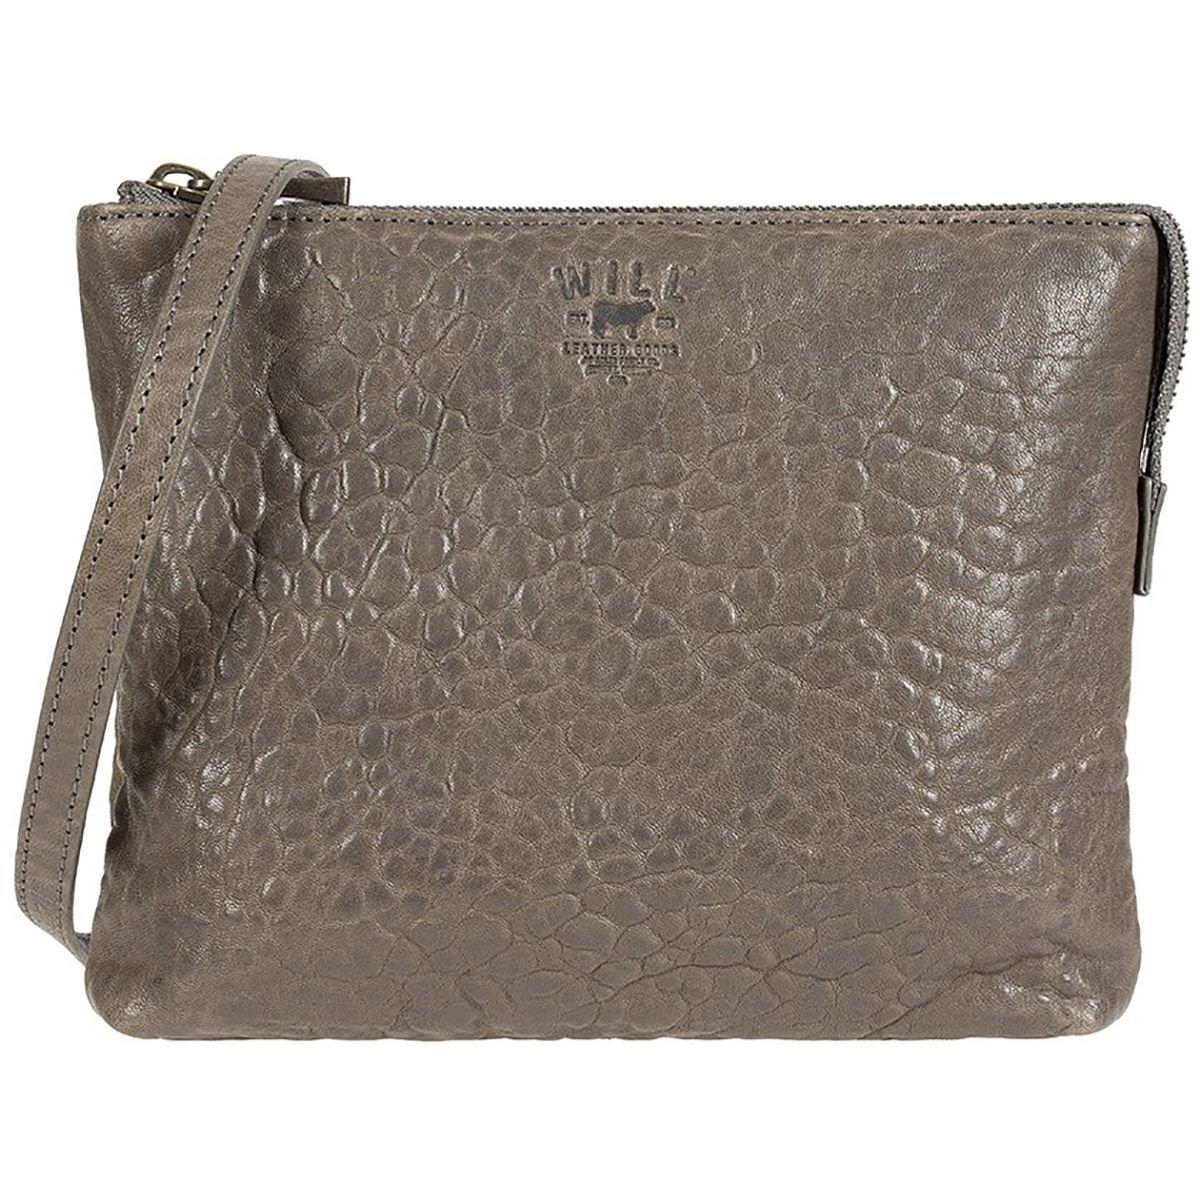 Will Leather Goods Opal Zip Pouch Crossbody Purse - Women's Grey, One Size